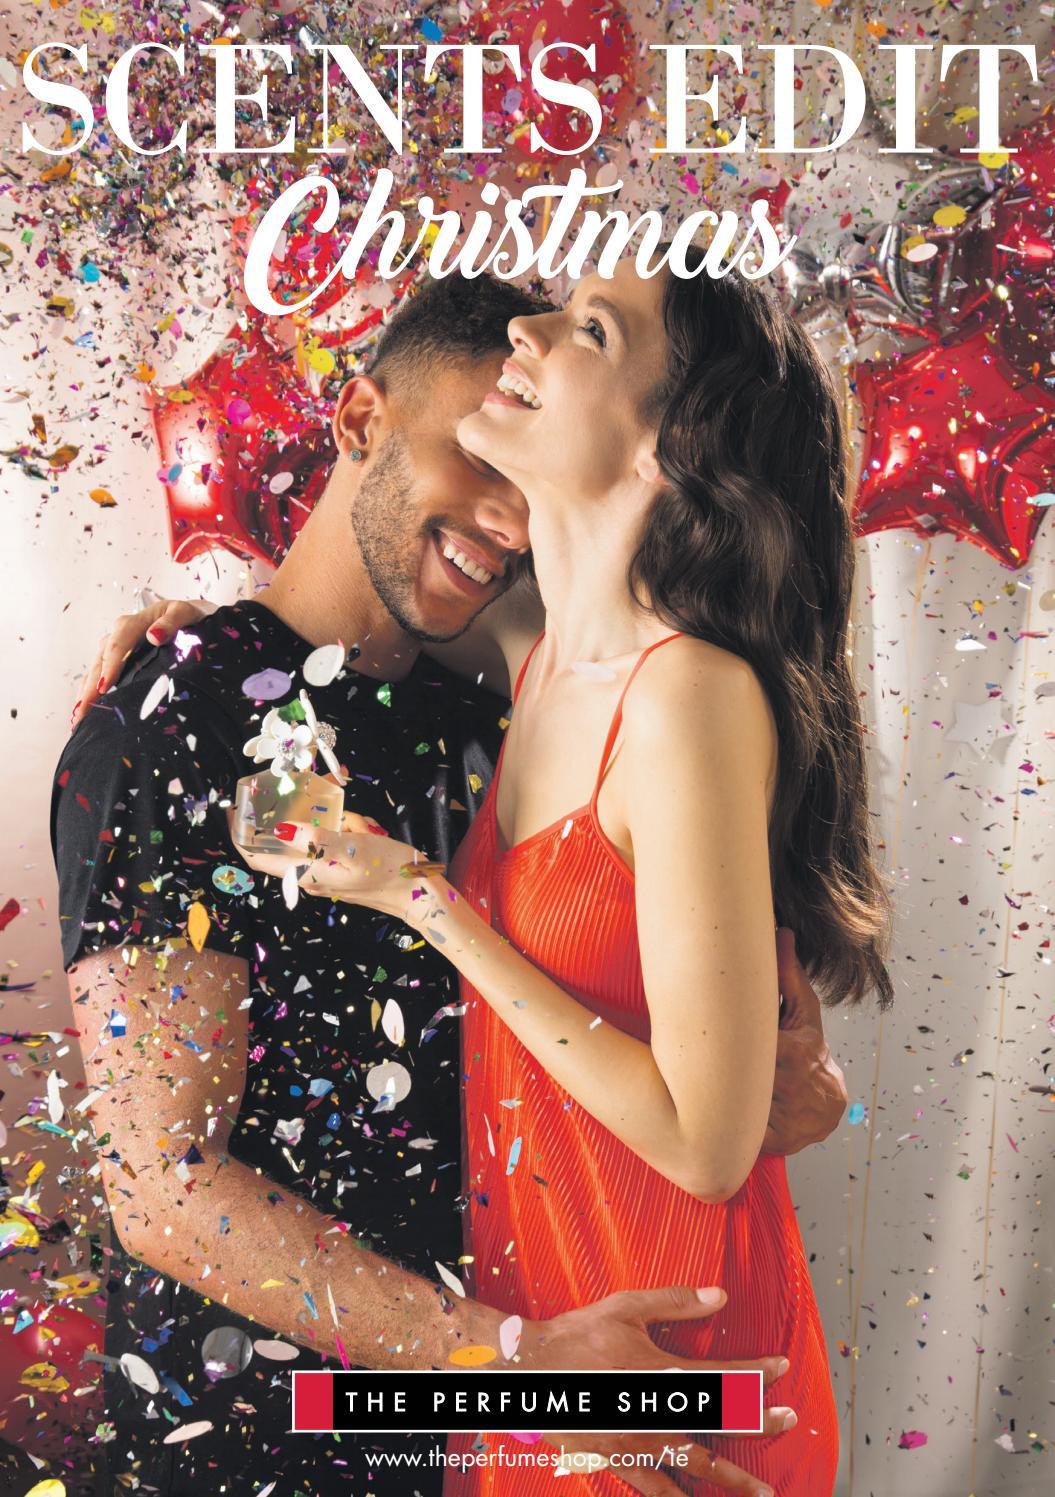 The Perfume Shop Christmas Gift Guide by The Perfume Shop - issuu 6dcbf16a9b